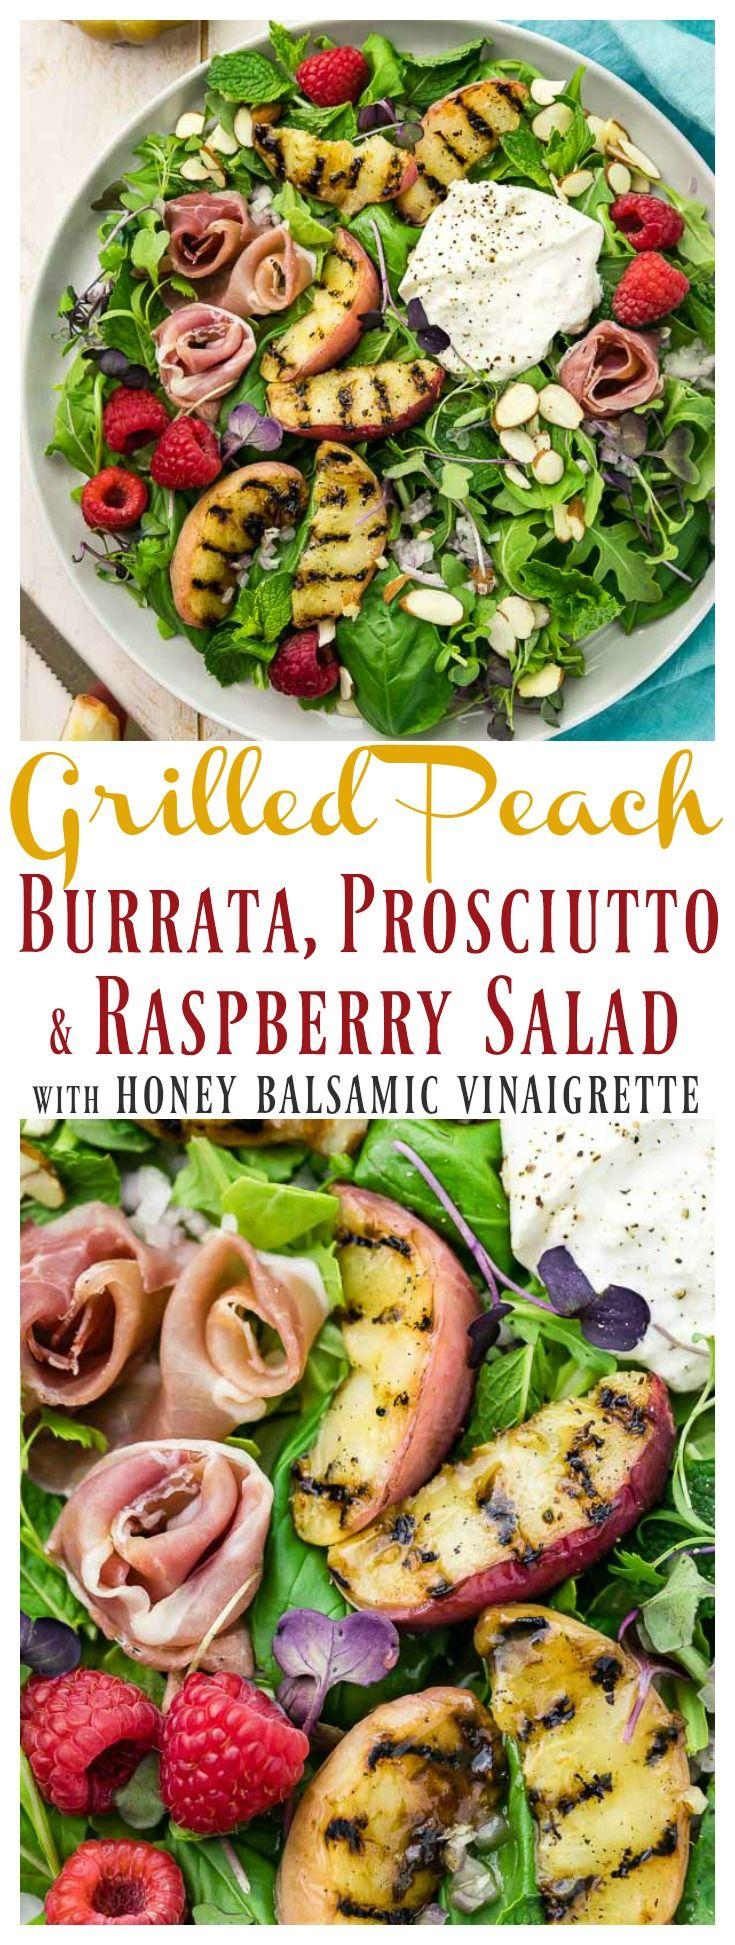 Grilled peach, Burrata, Prosciutto & Raspberry Salad with Honey Balsamic Vinaigrette